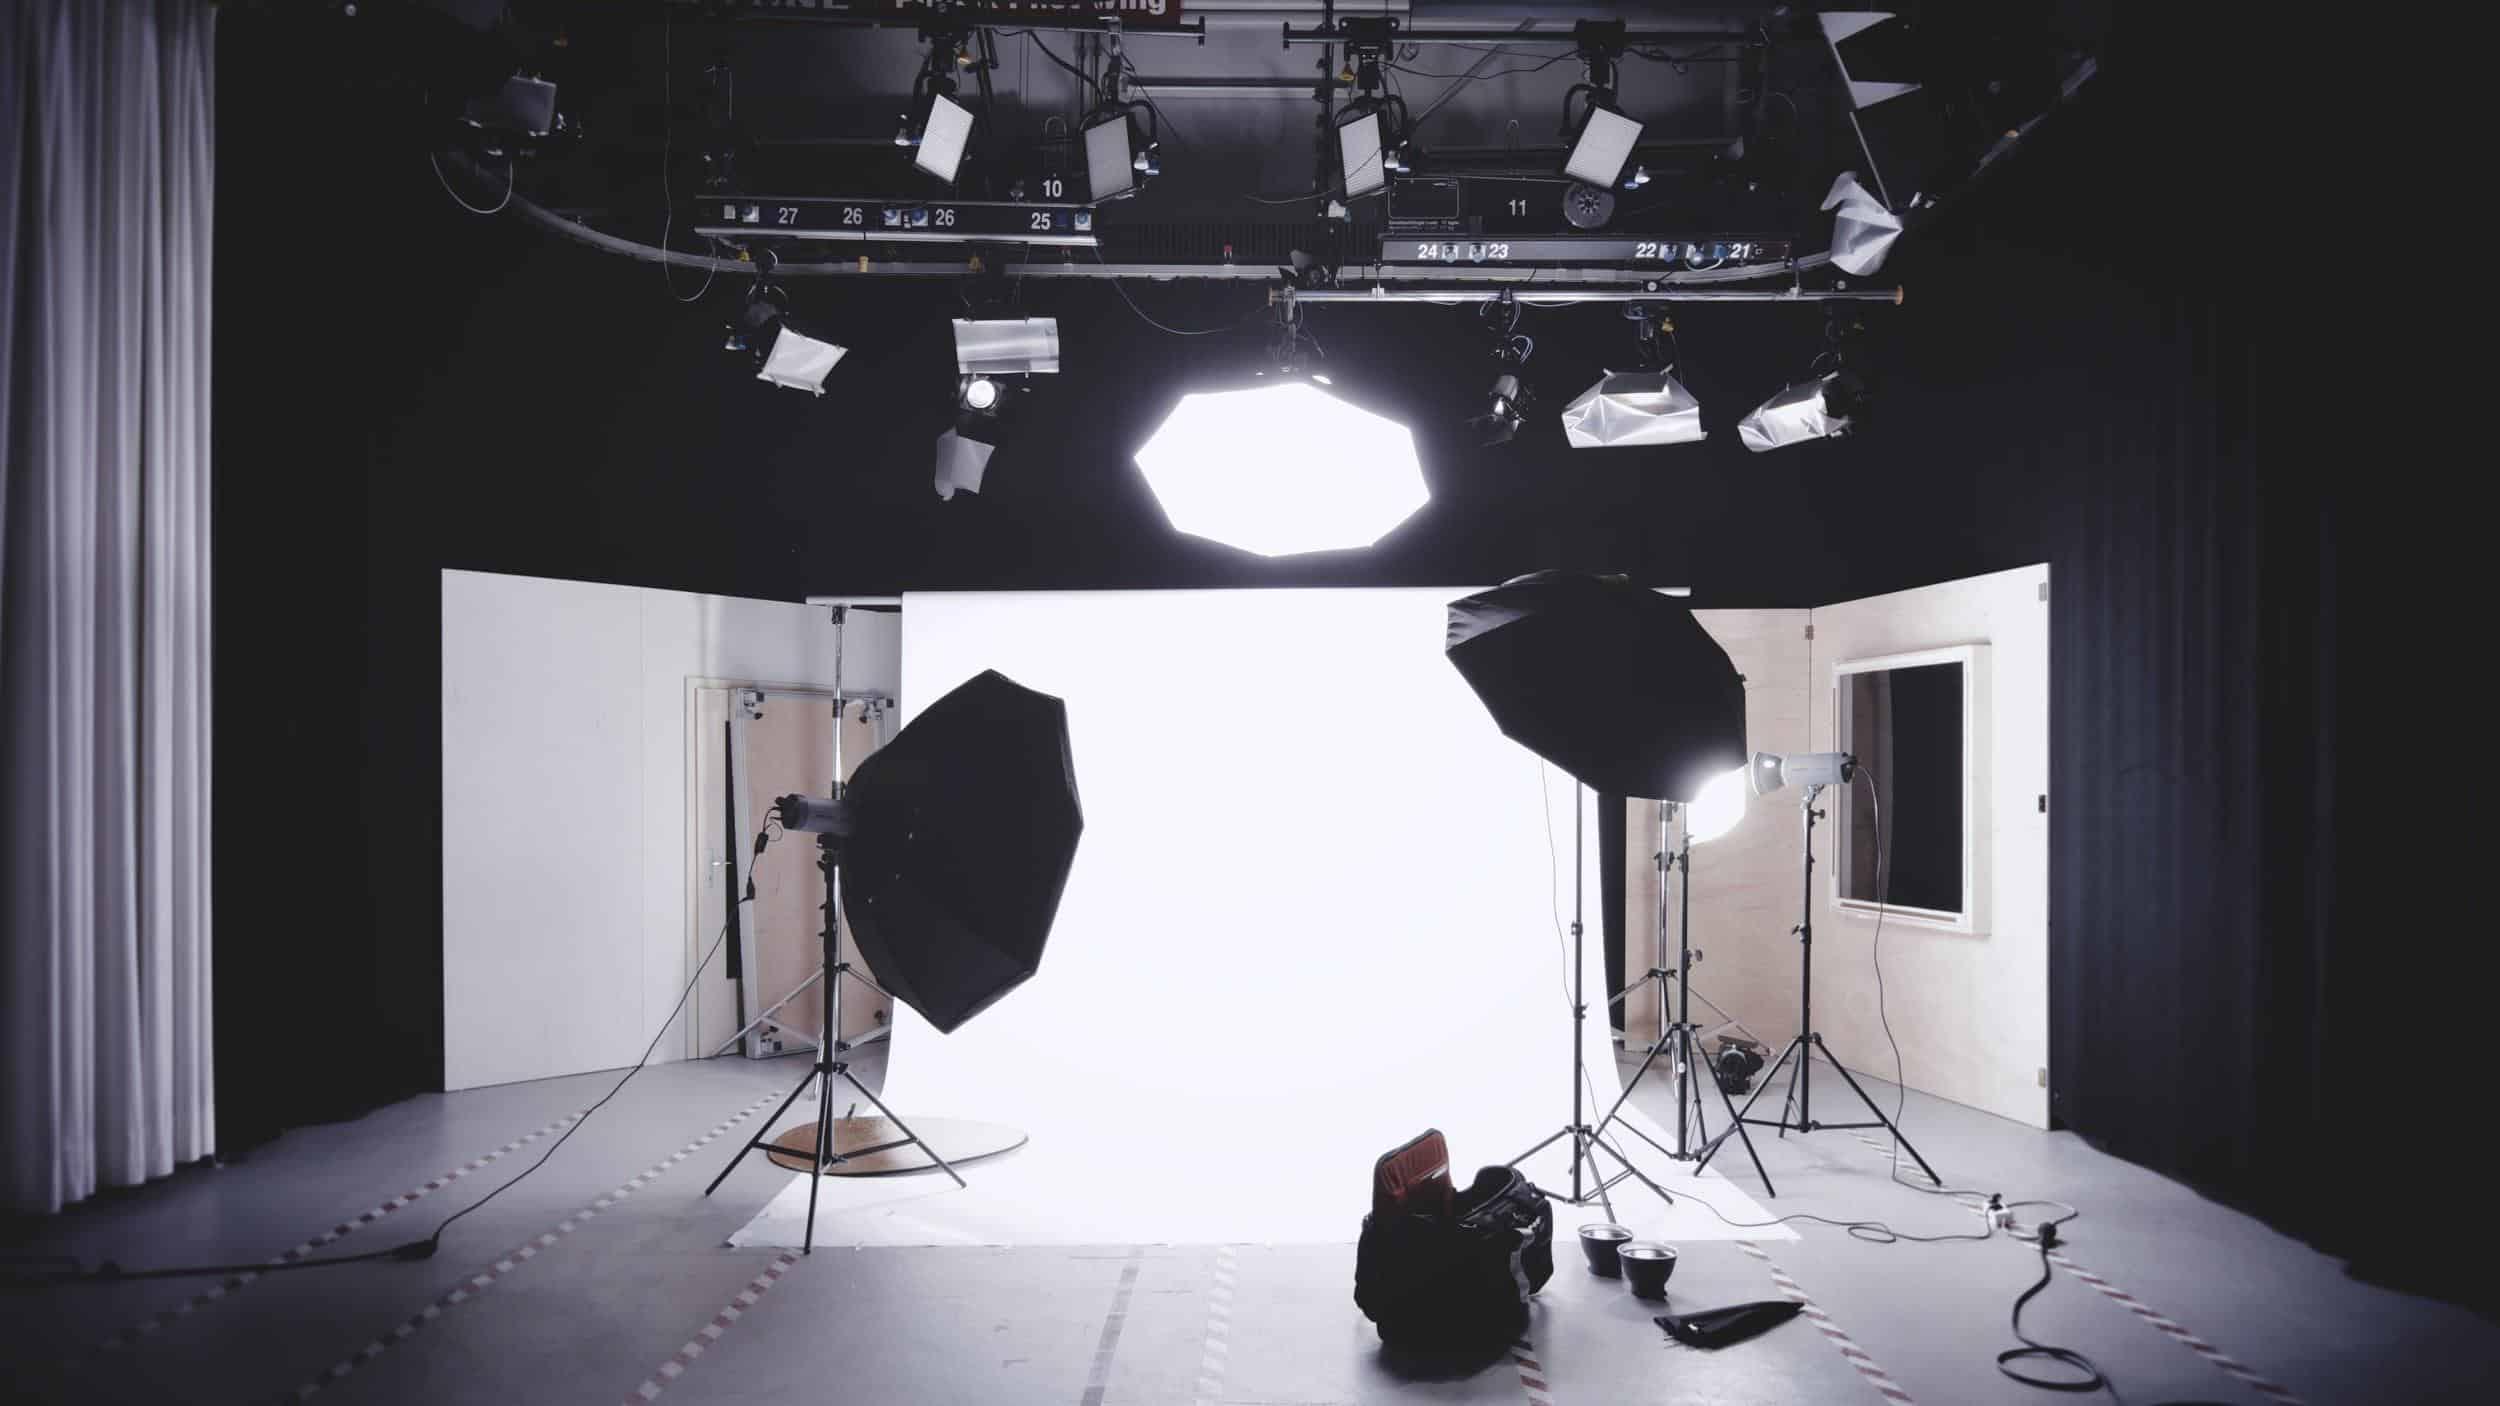 Miranda Paquet - Realtor Headshots: 15 Industry Experts Share Their Best Advice